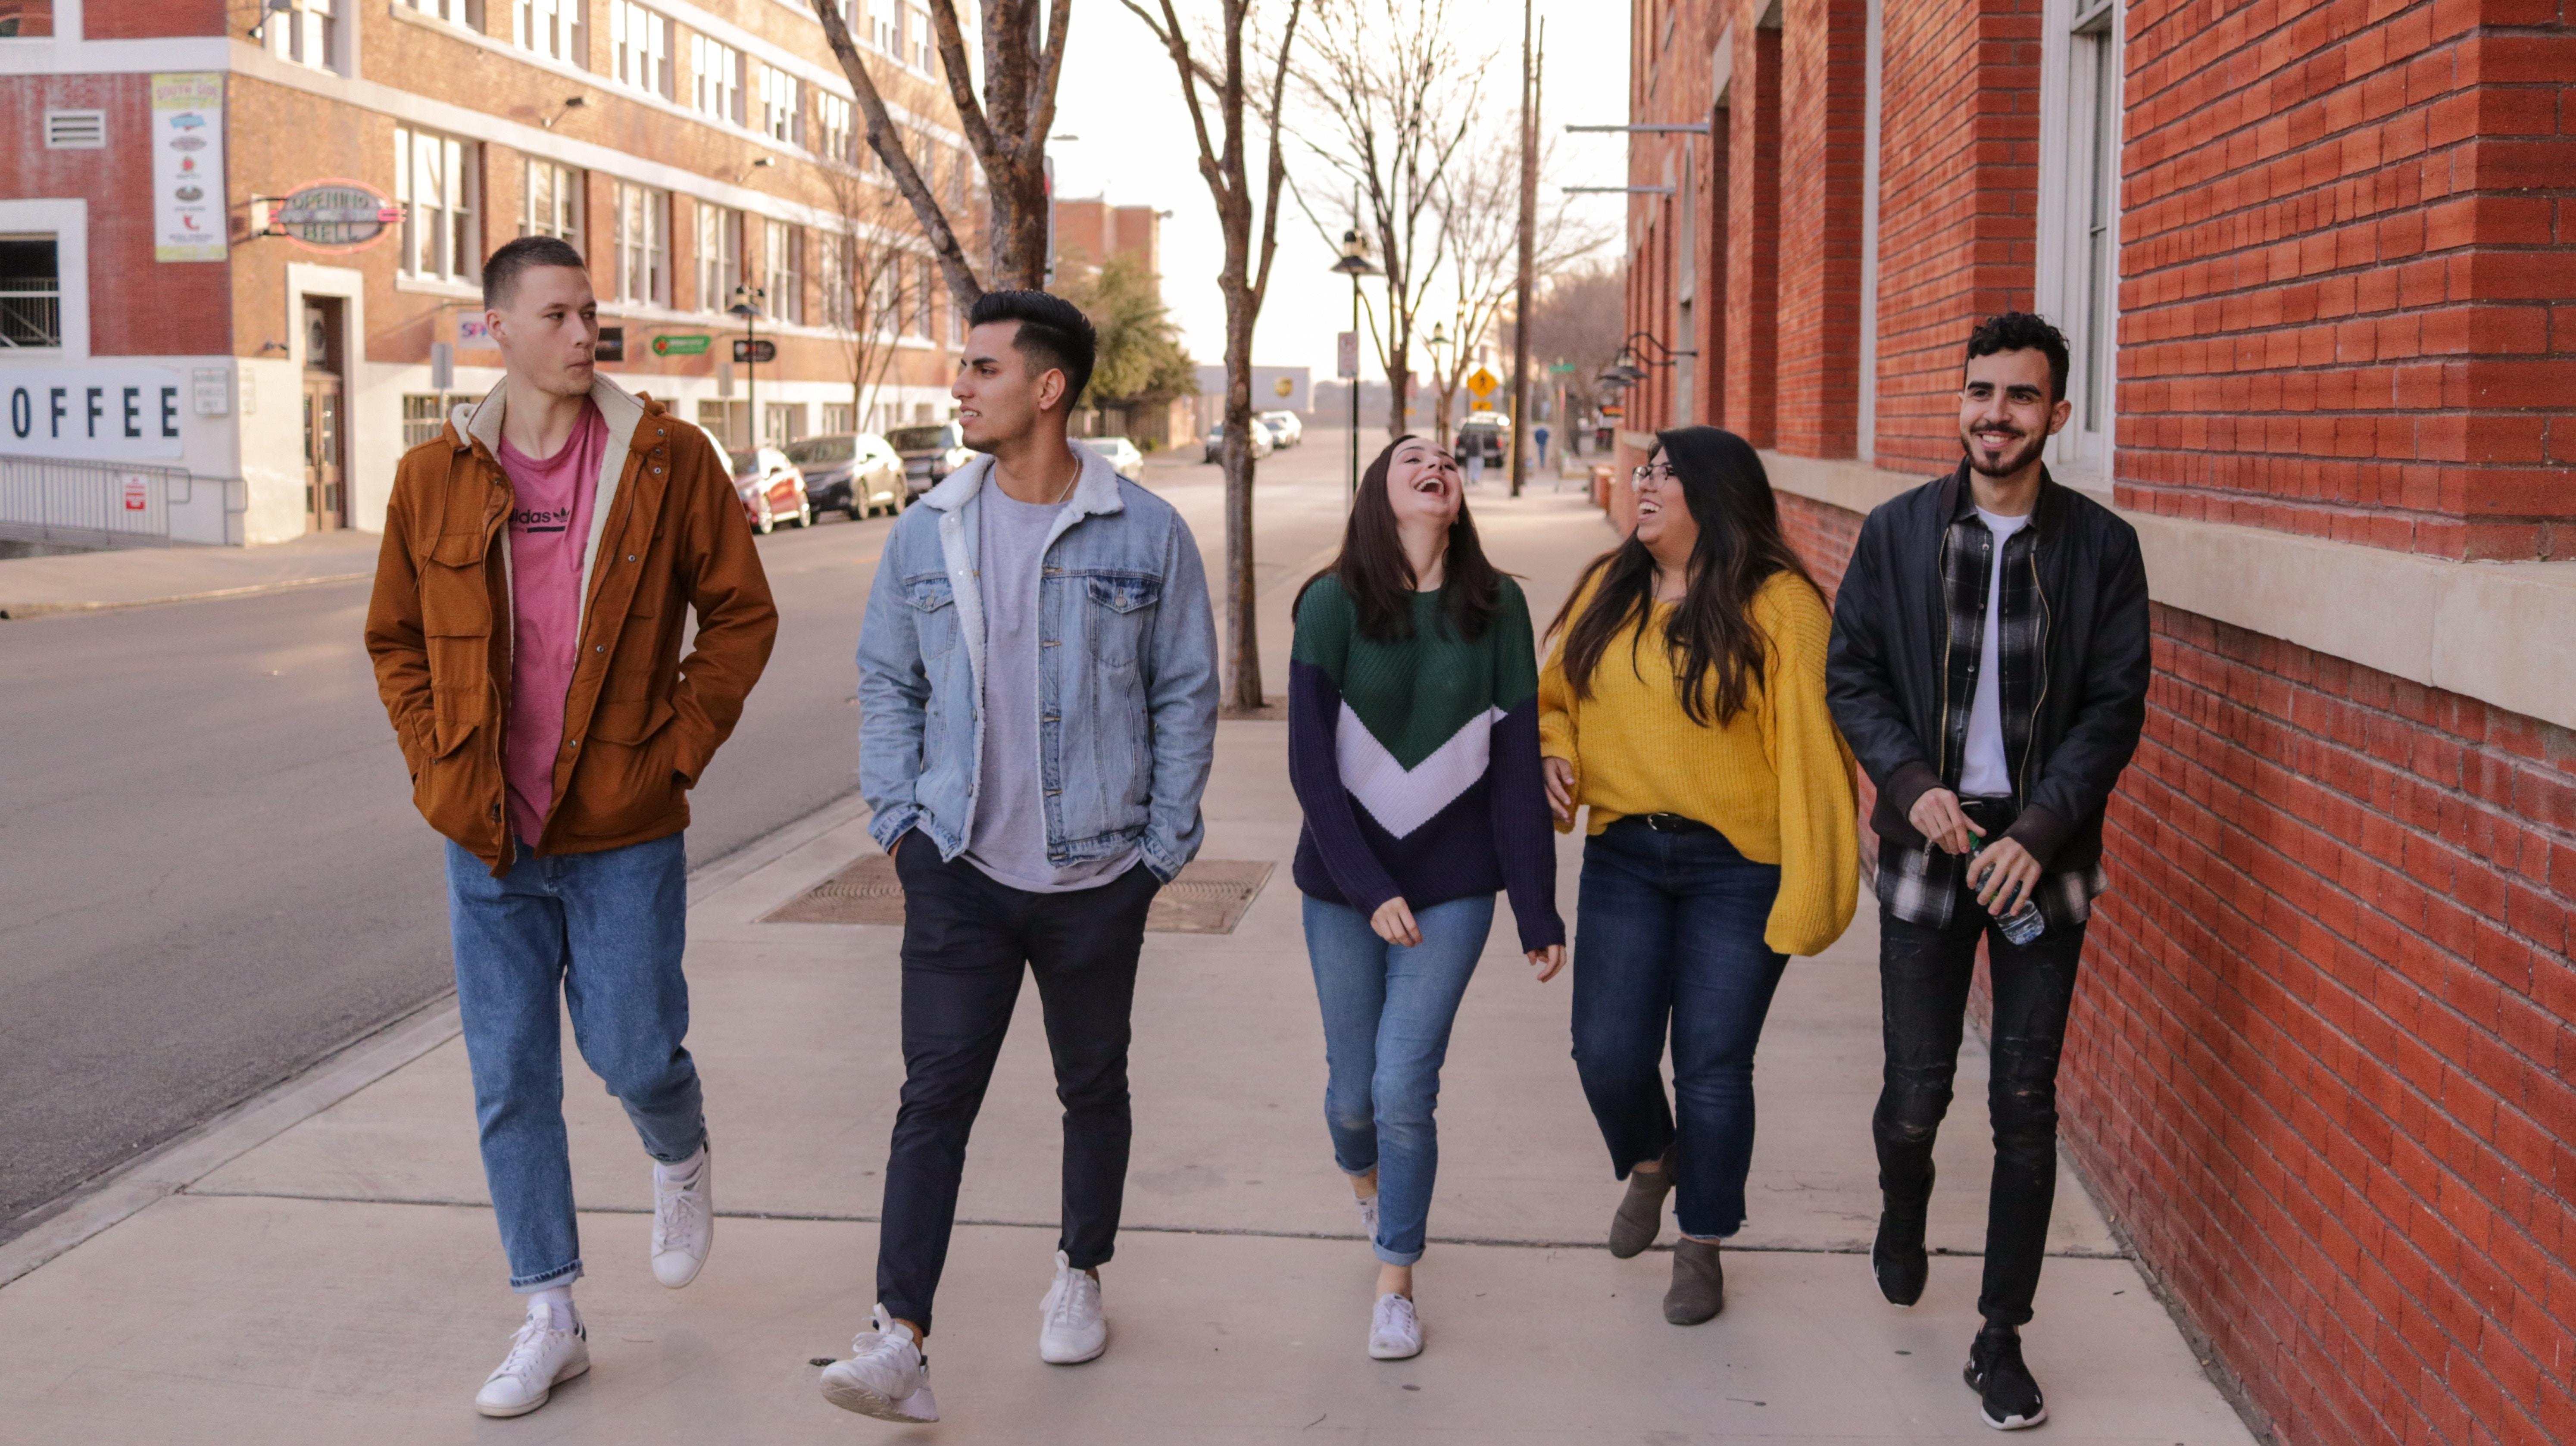 teenagers walking on the street